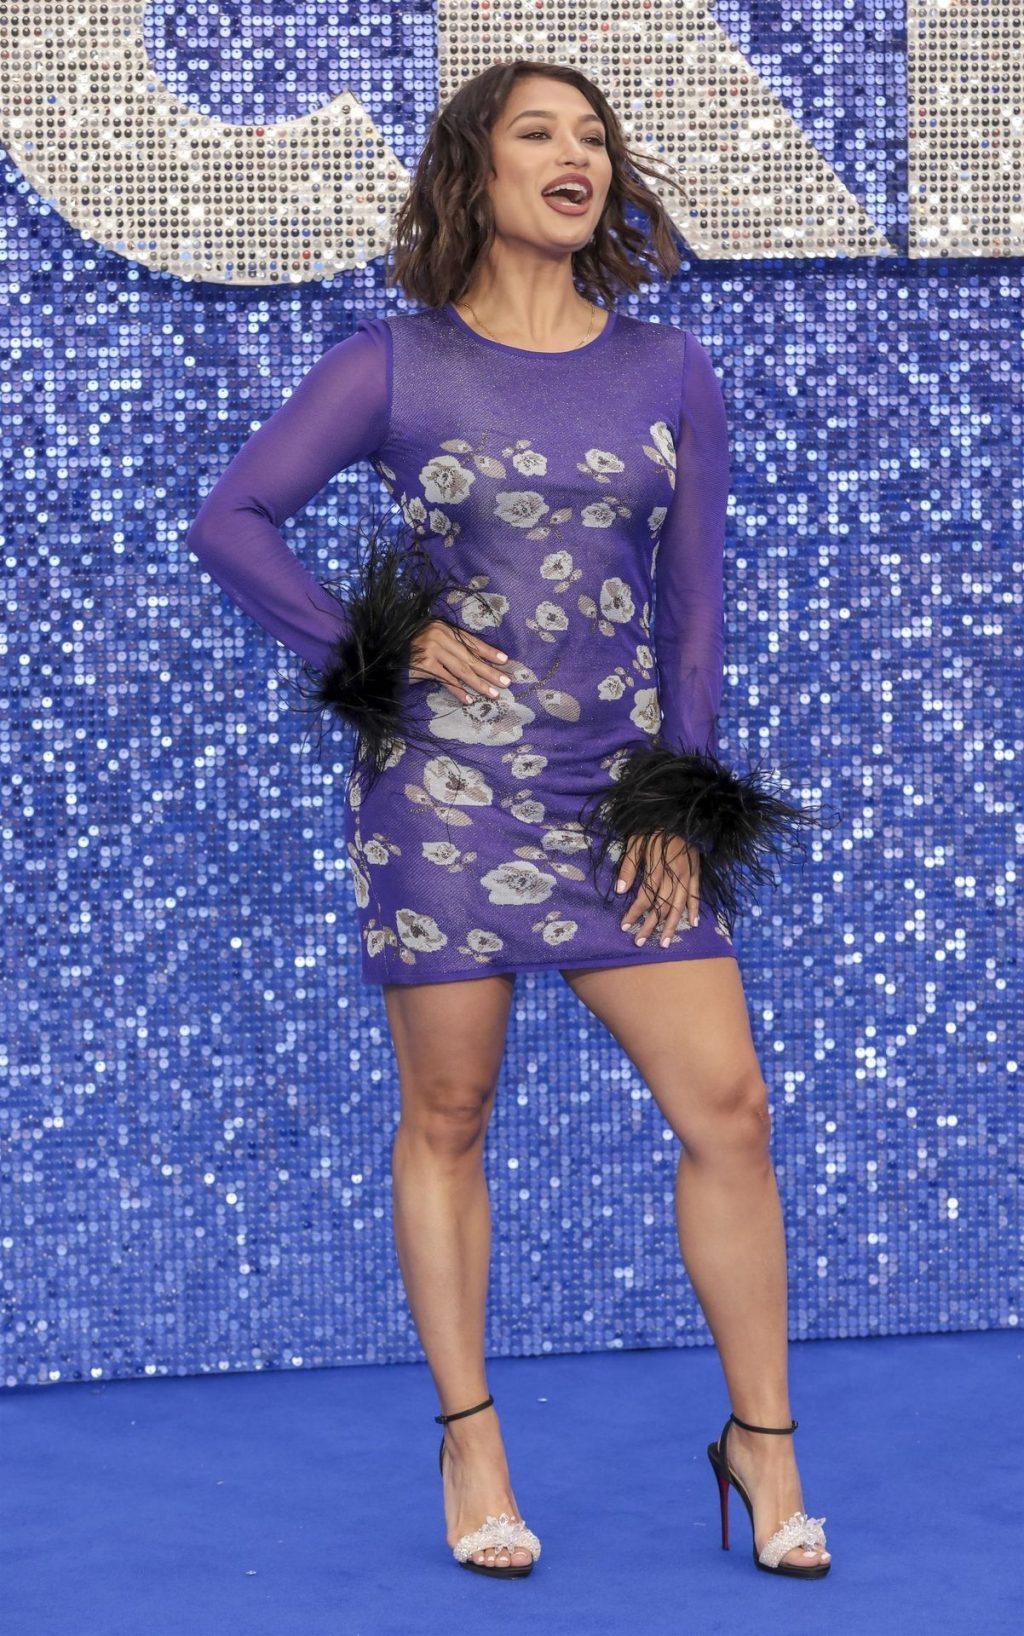 Vanessa White Sexy (21 Photos)